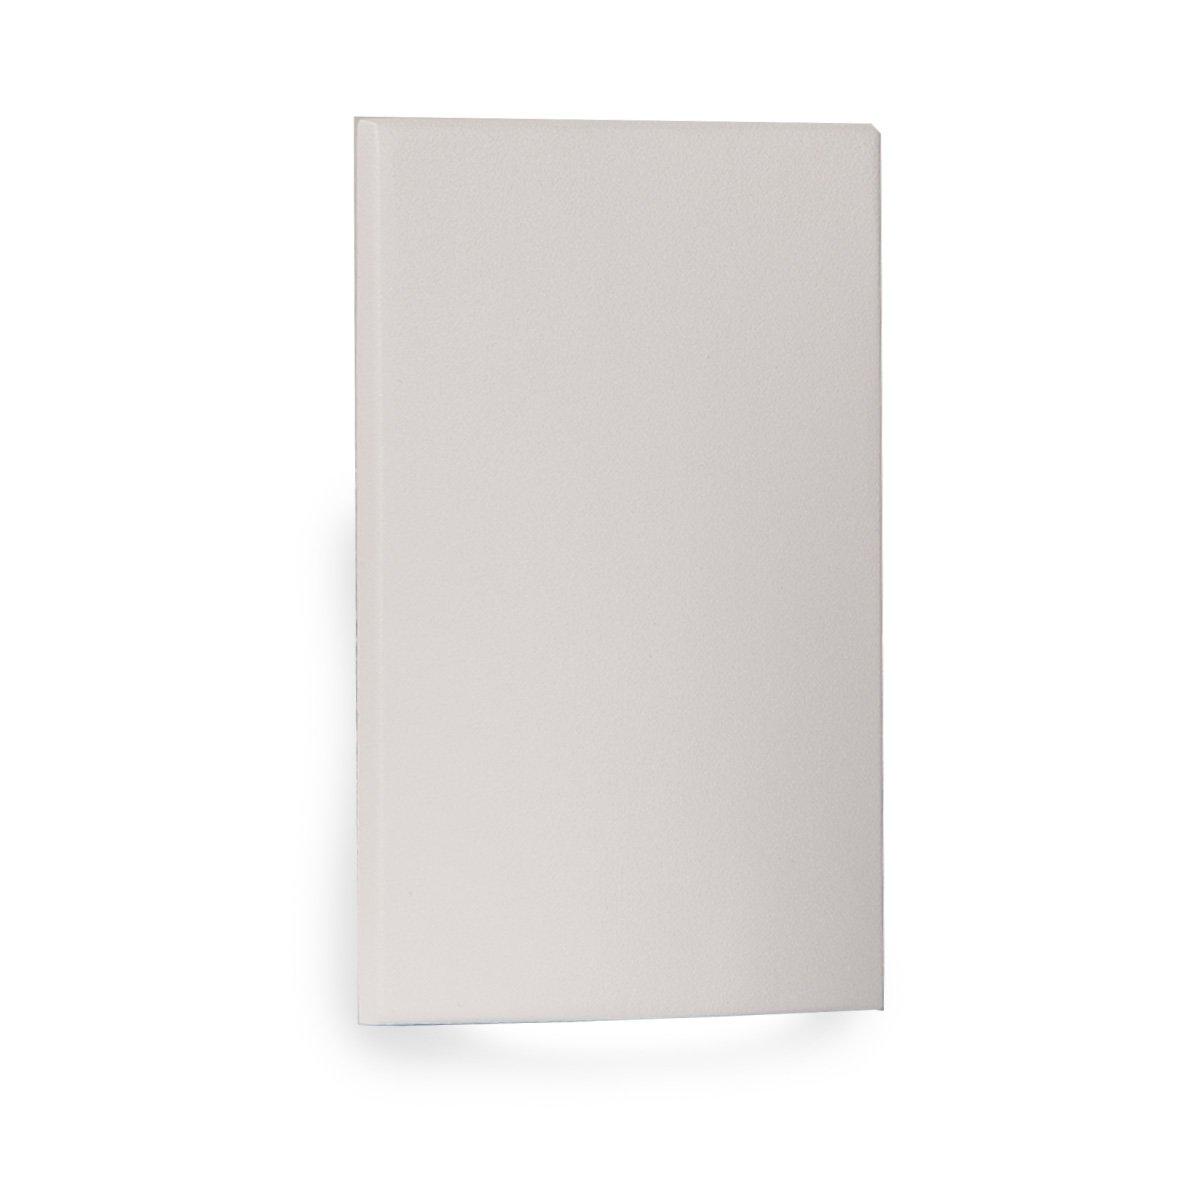 WAC Lighting WL-LED210-AM-WT WAC Landscape LED Vertical Scoop Step and Wall Light 120V Amber, White